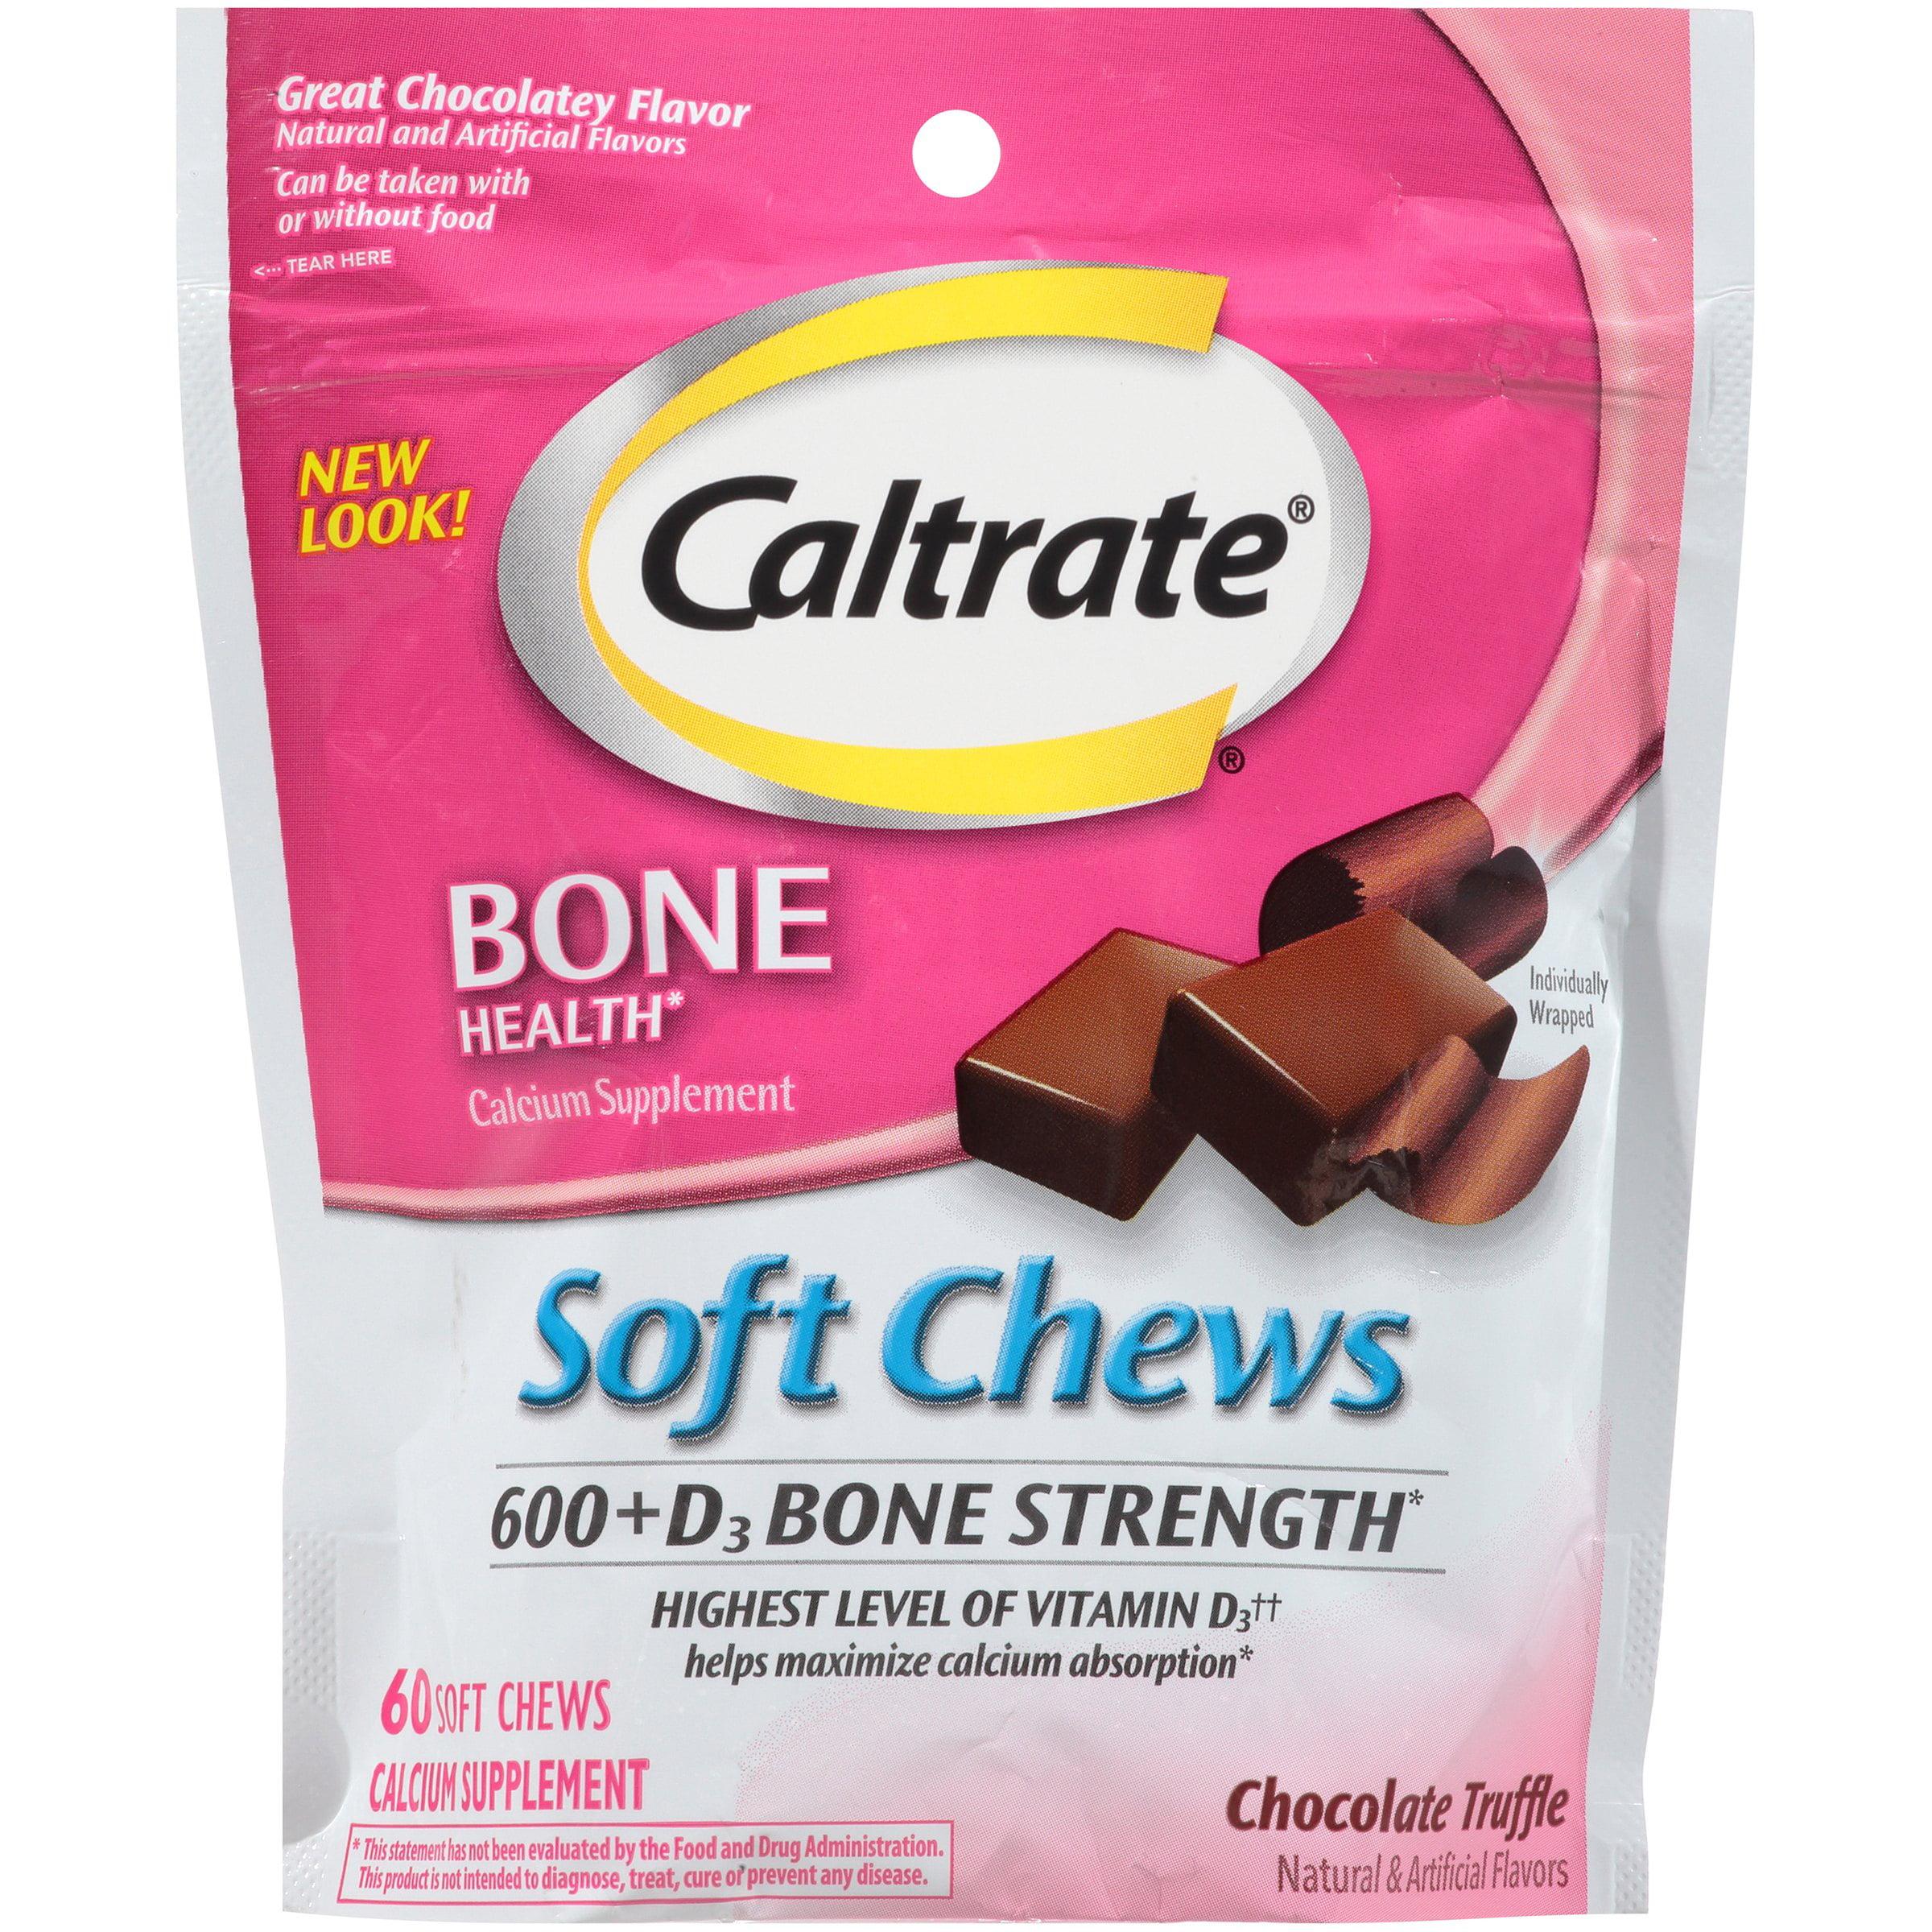 Caltrate Bone Health 600+D3 Chocolate Calcium Soft Chews, 60 Ct